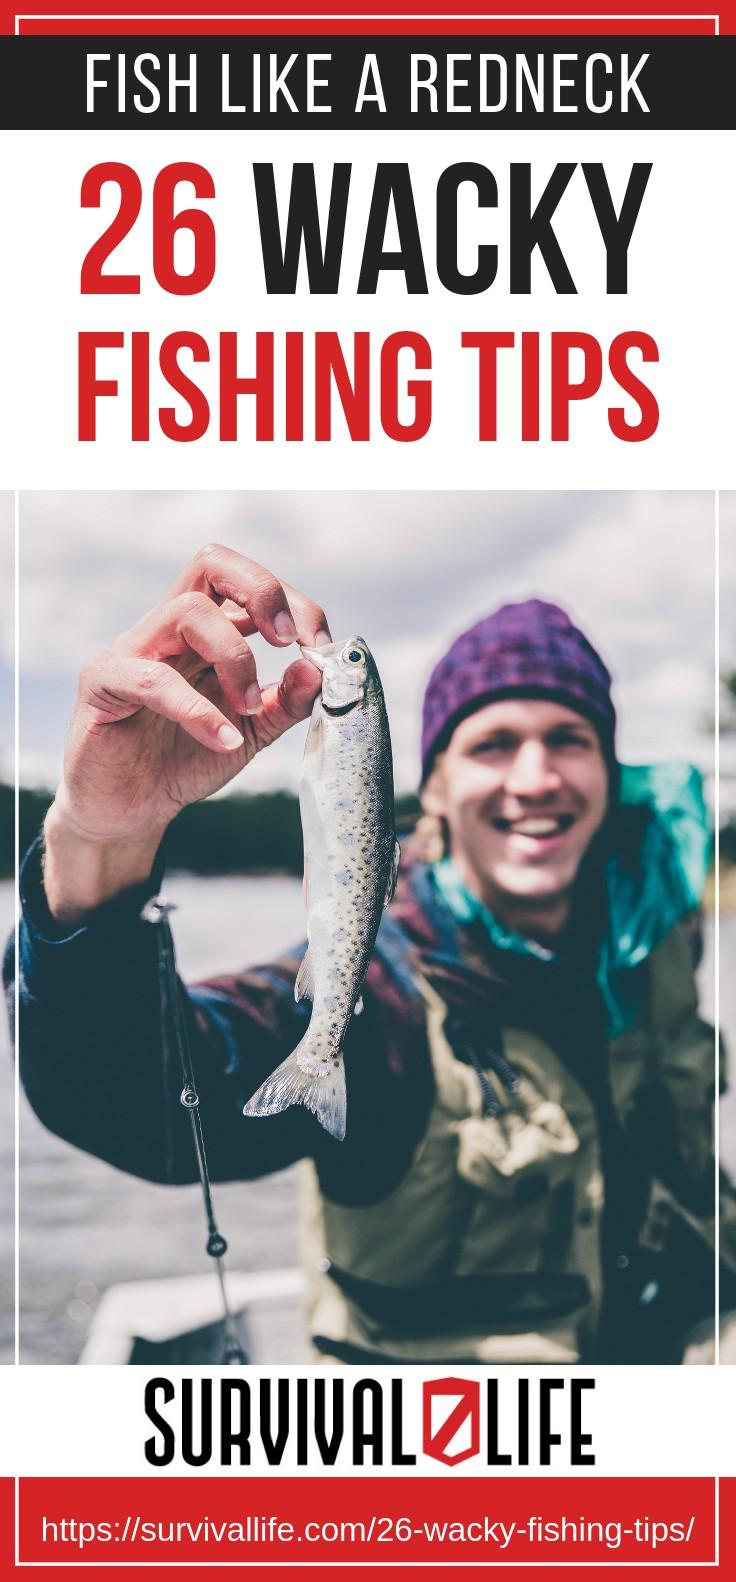 Wacky Fishing Tips To Help You Fish Like A Redneck | https://survivallife.com/26-wacky-fishing-tips/